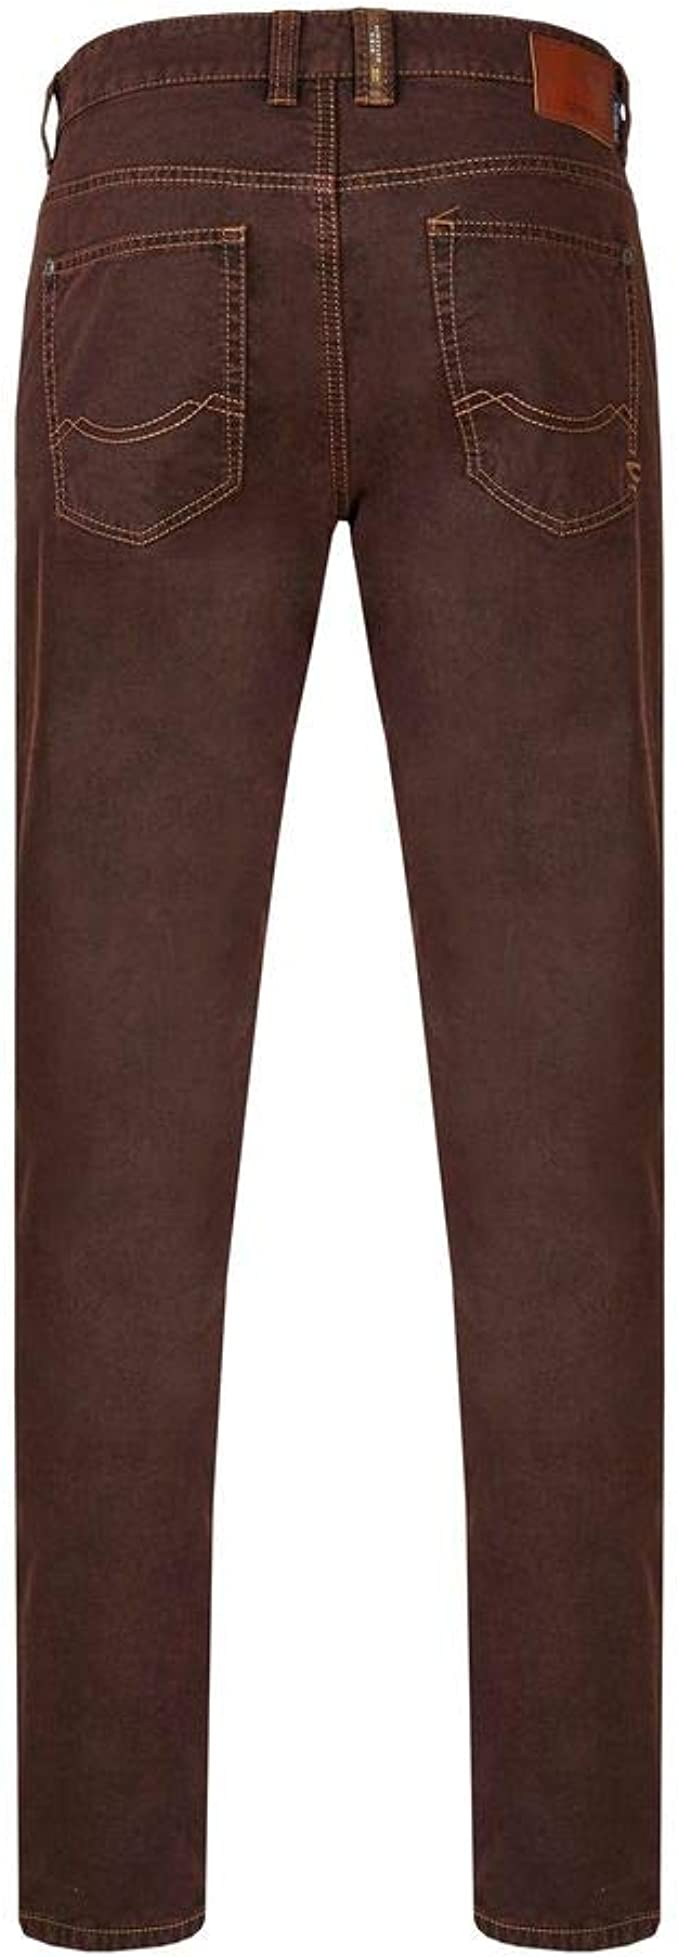 Camel Active Hose 48952E 8+05 dark red Jeans | Trekking